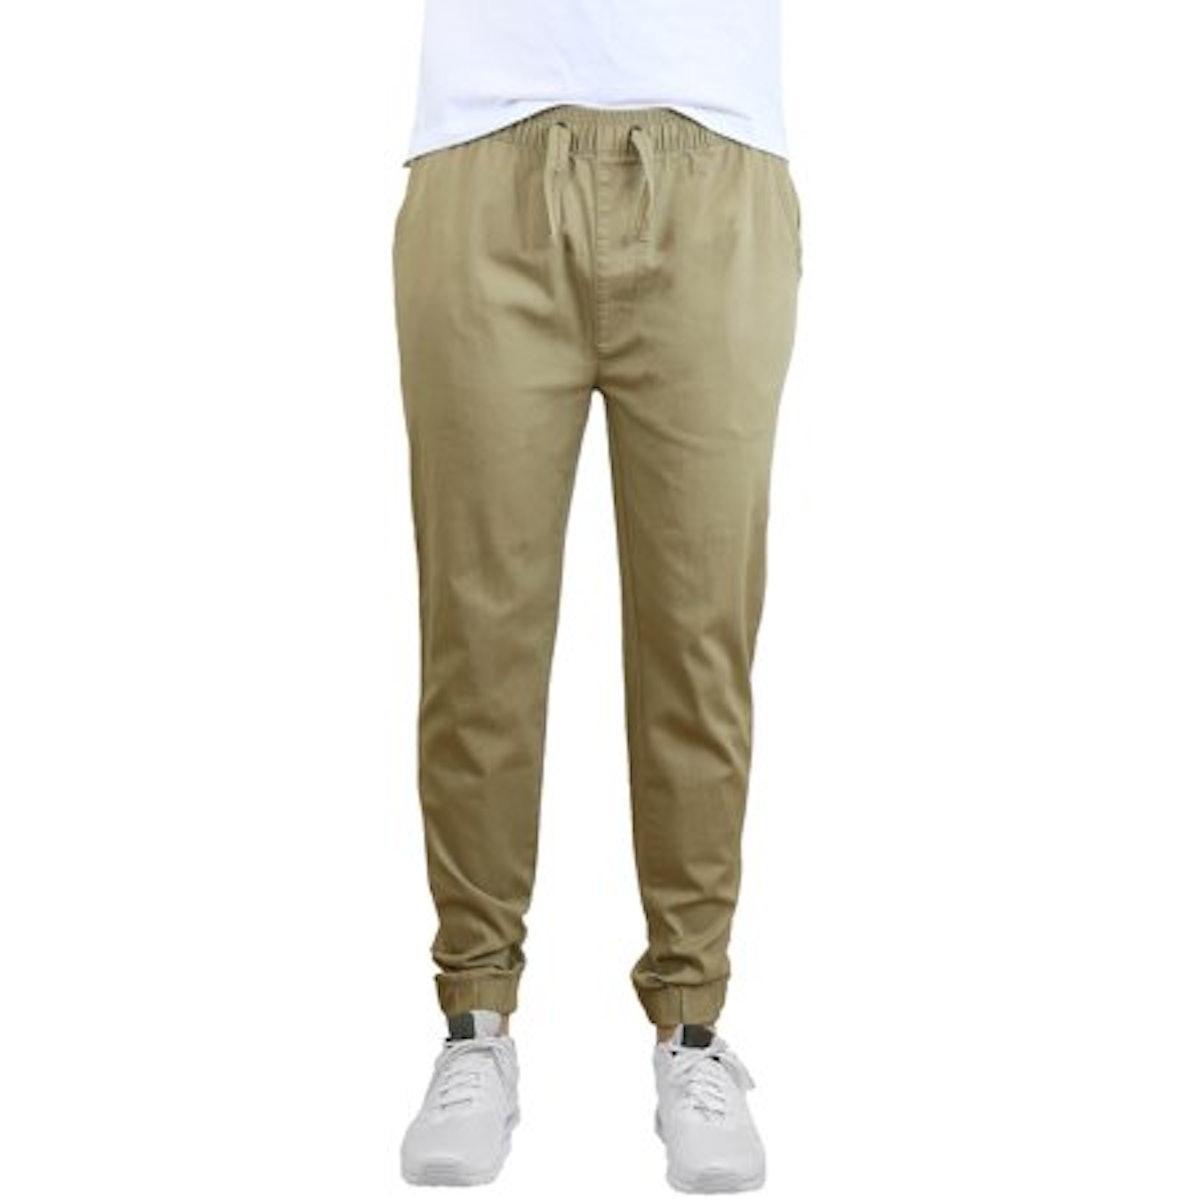 Mens Joggers Chino Pants Stretch Twill Slim Fit